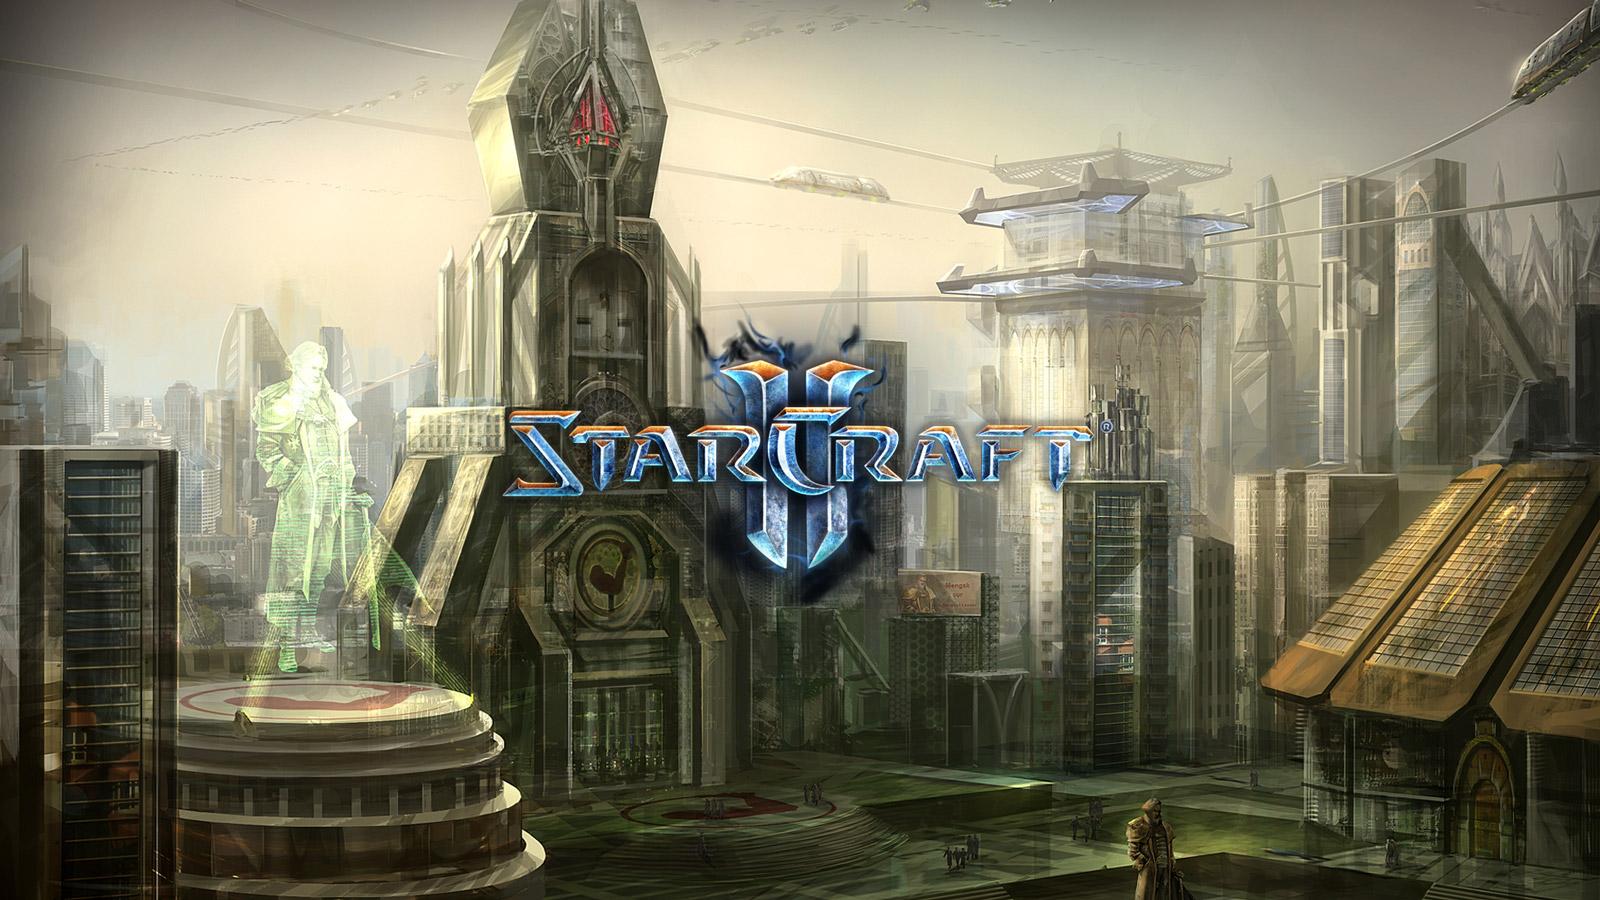 Free Starcraft 2 Wallpaper in 1600x900